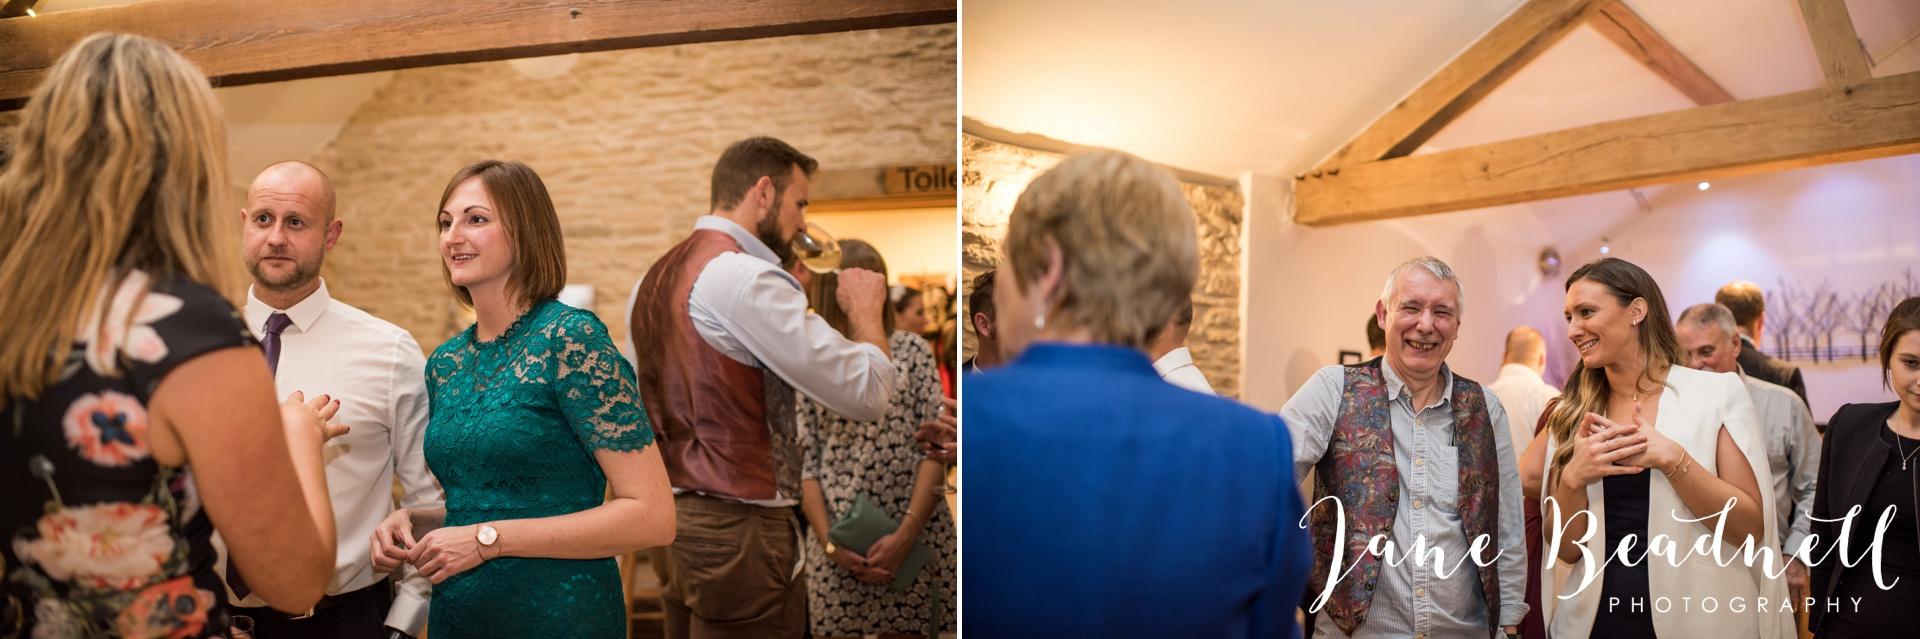 The Kingcote Barn Bristol Yorkshire and destination wedding photographer Jane Beadnell Photography_0096